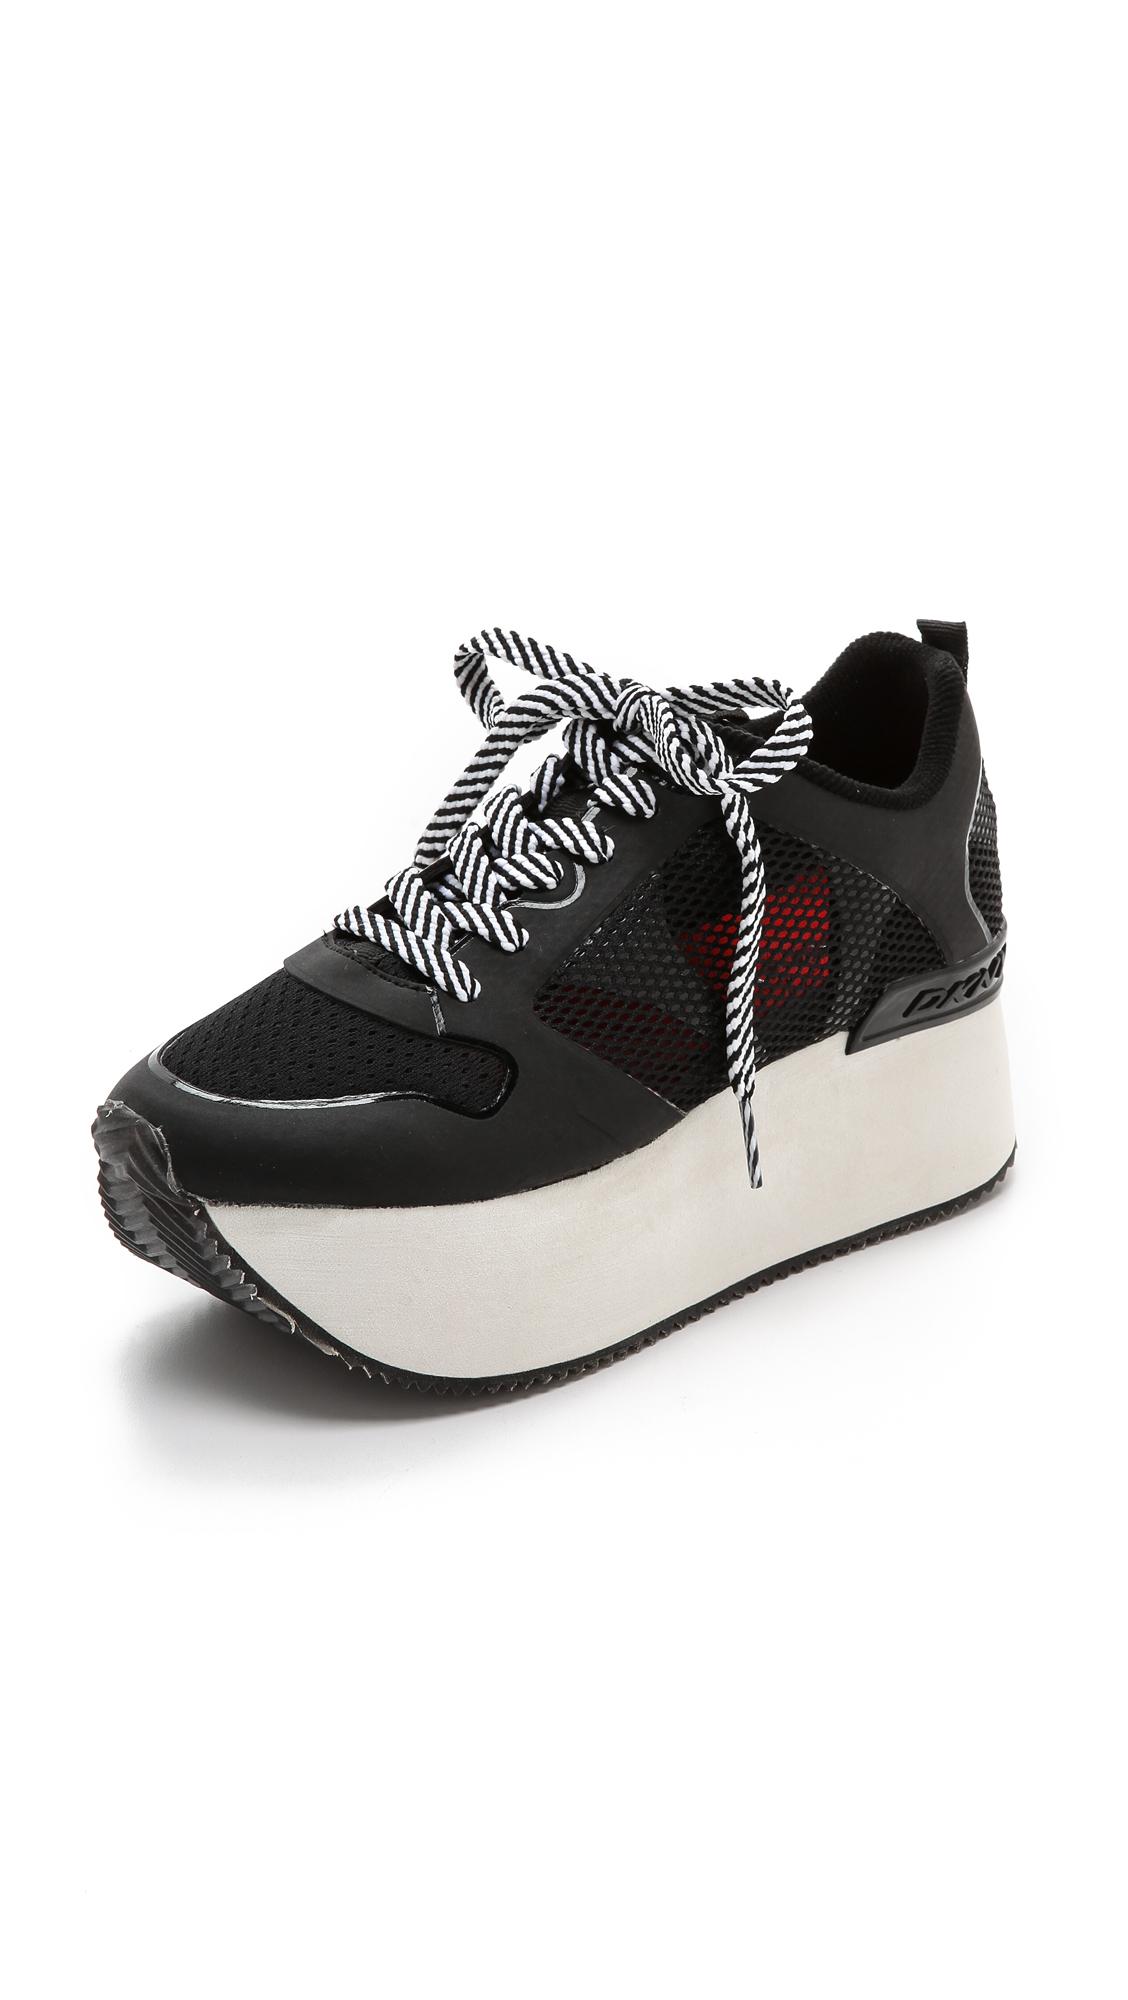 Dkny Black Platform Shoes